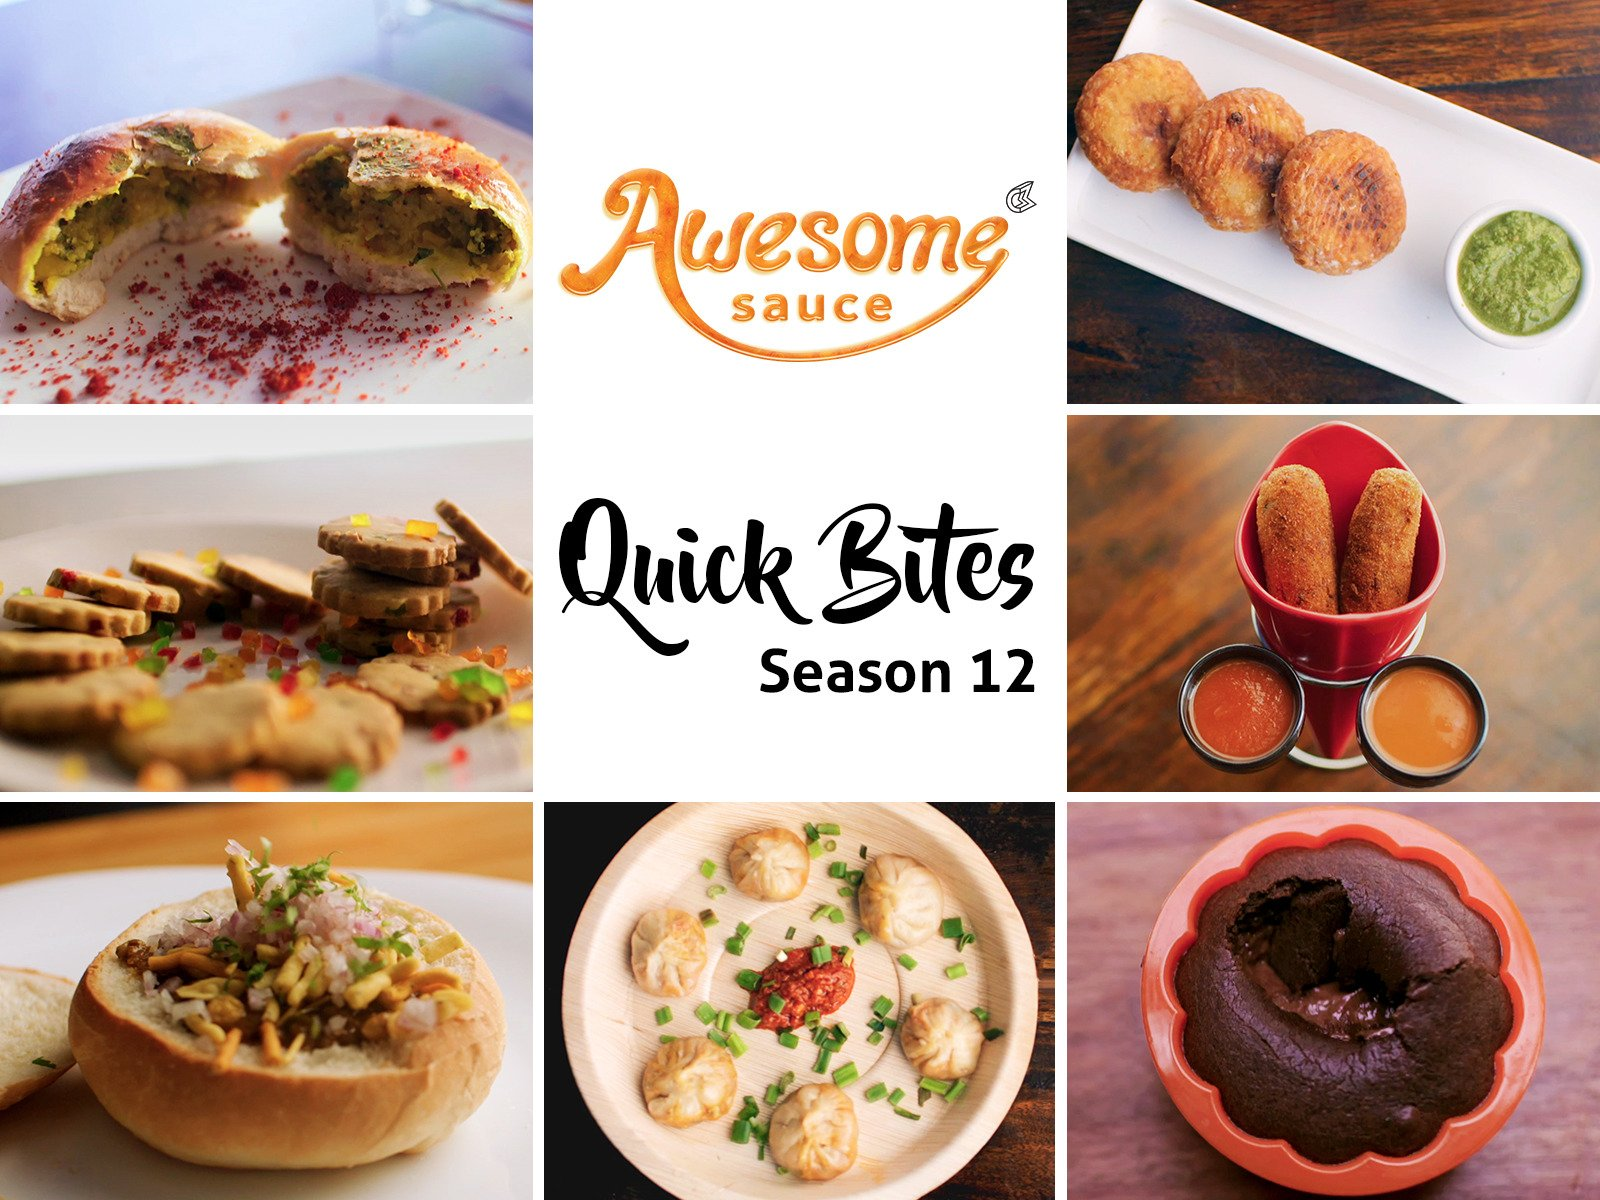 Clip: Quick Bites - Season 12